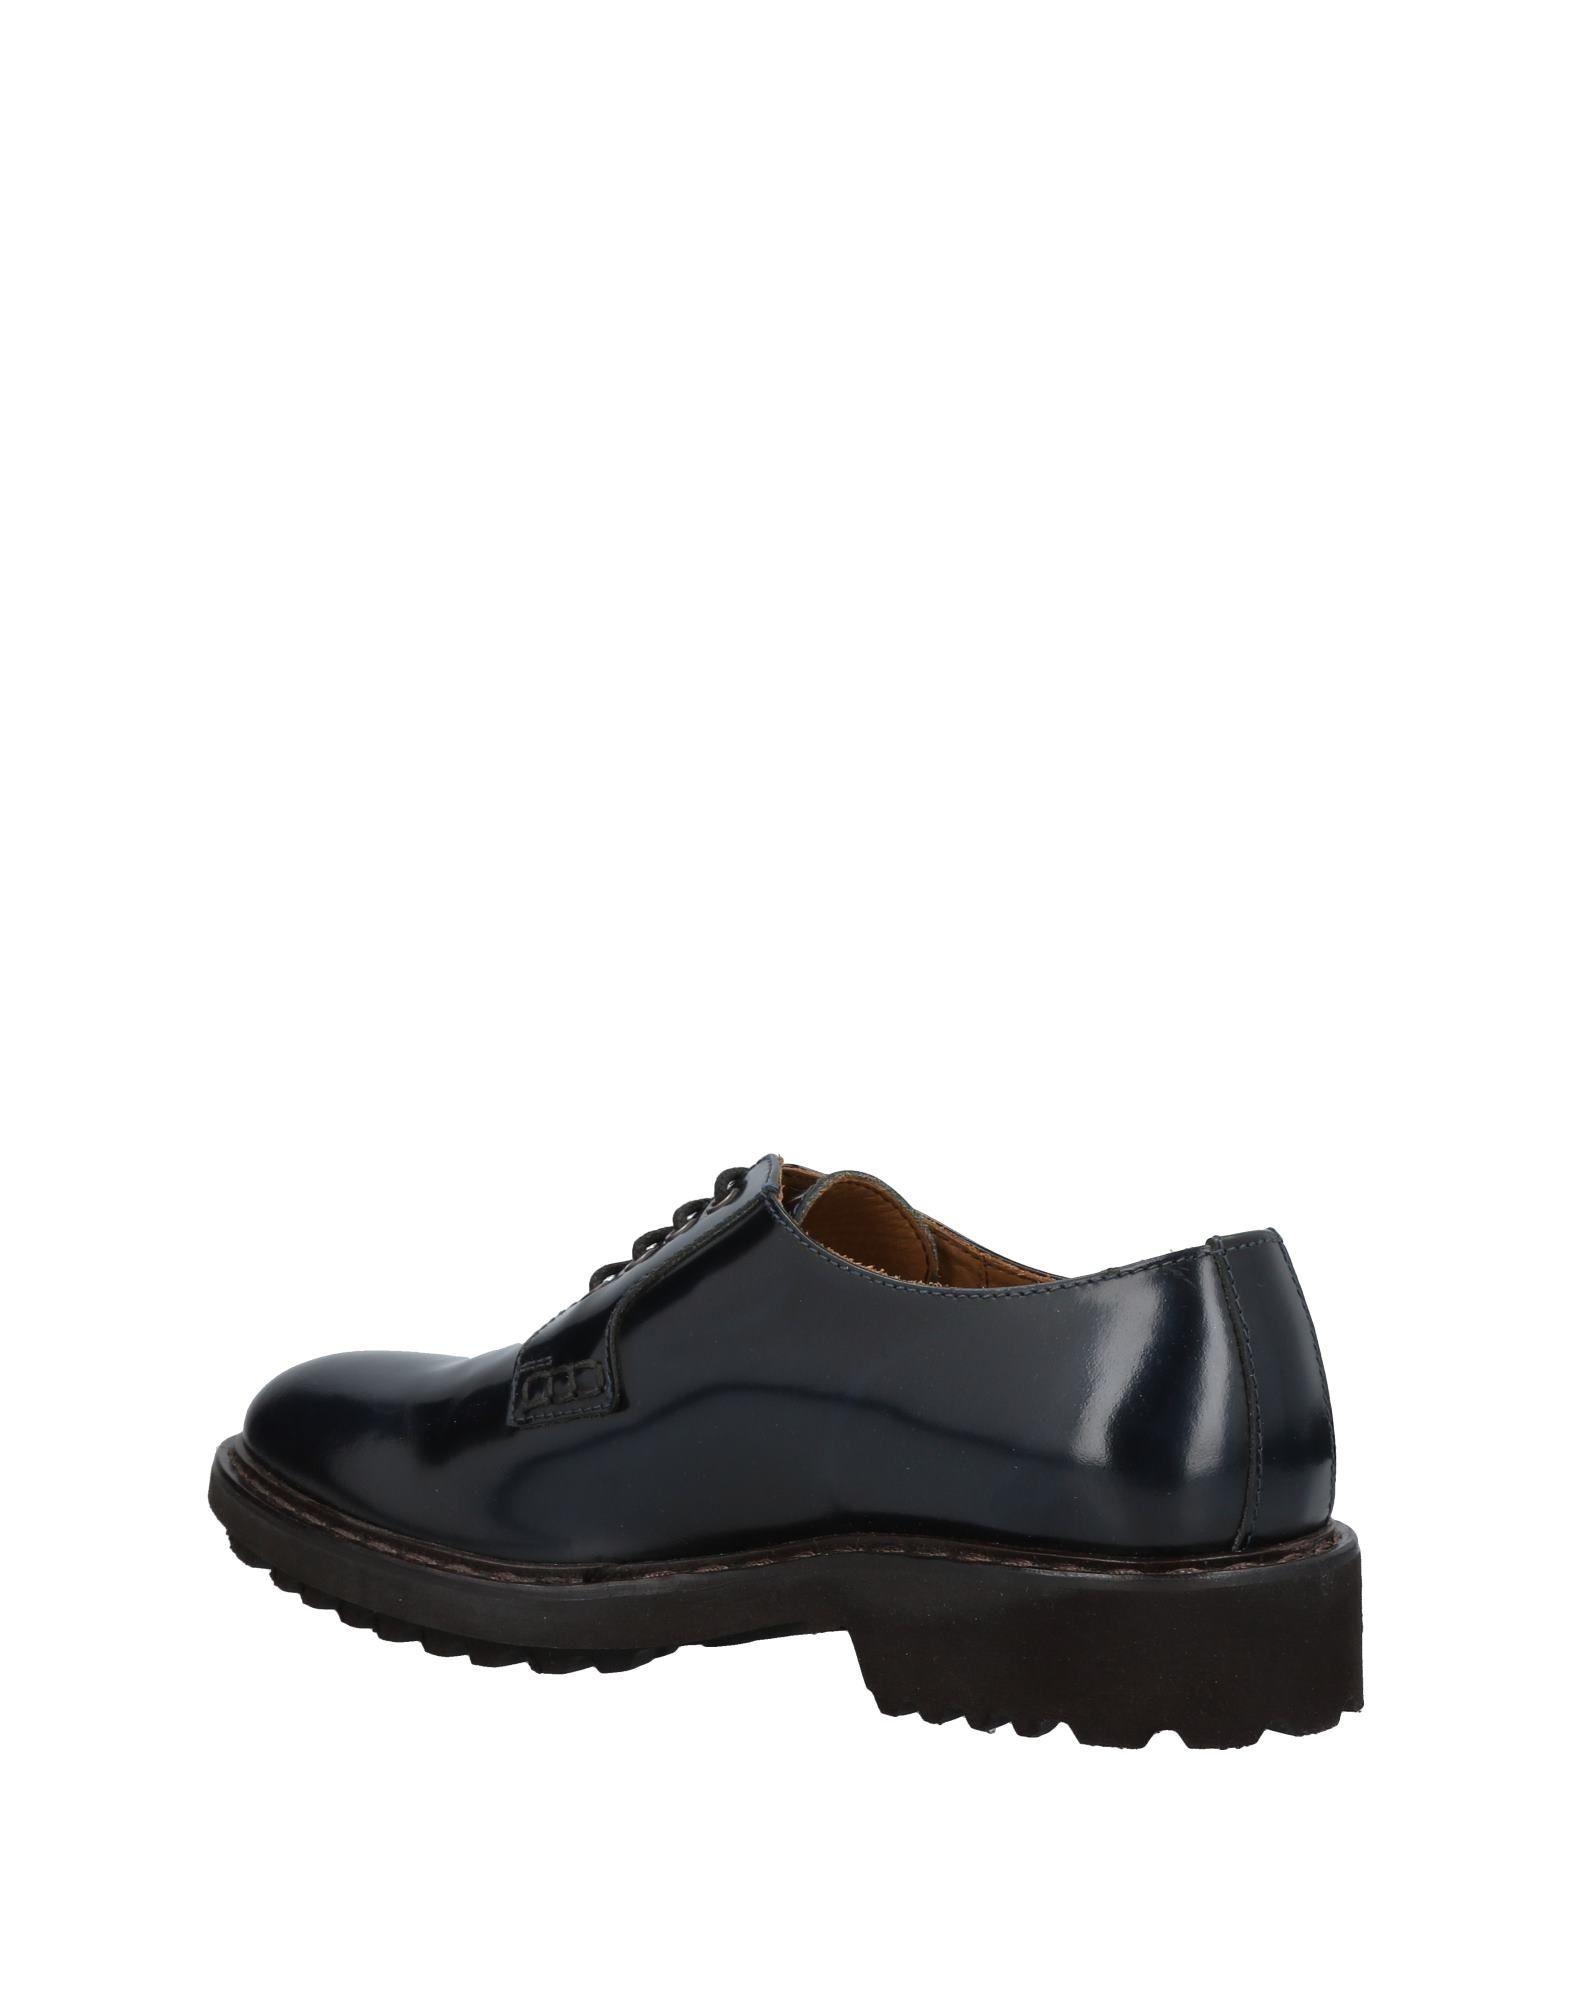 Mauro Ferrini Schnürschuhe Damen  11459747HJ Gute Qualität beliebte Schuhe